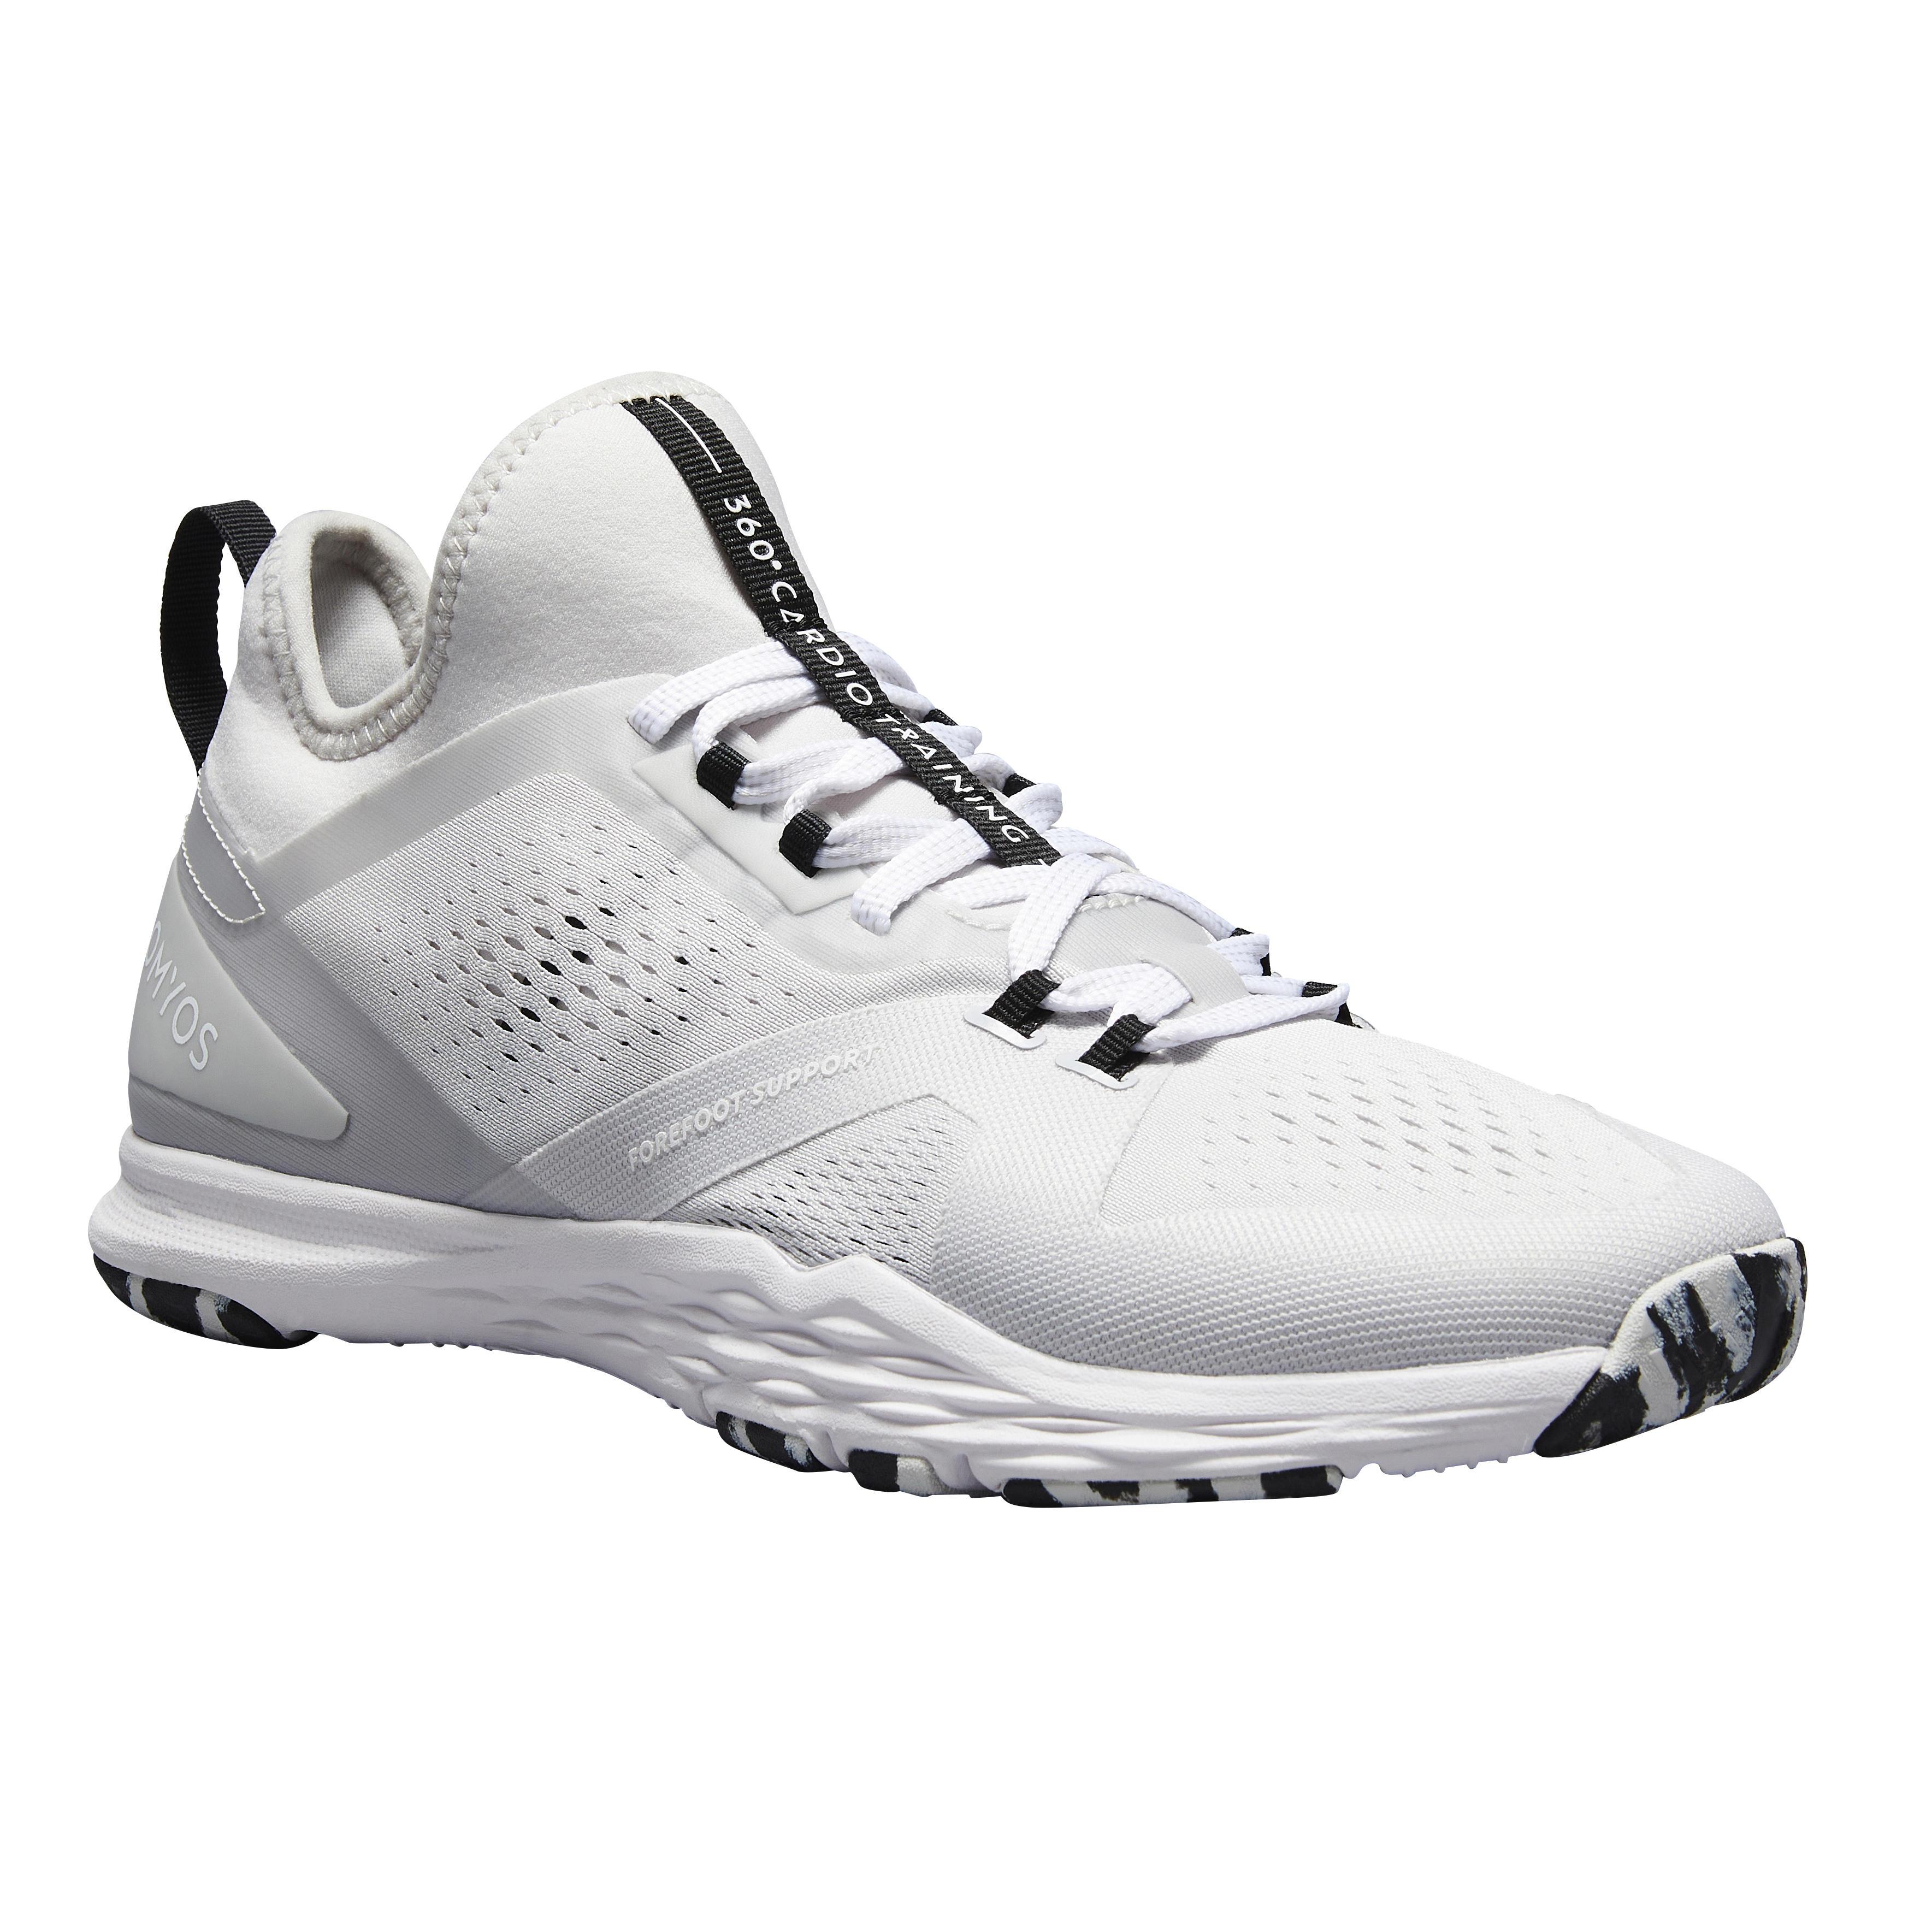 Fitness Cardio Shoes - Decathlon